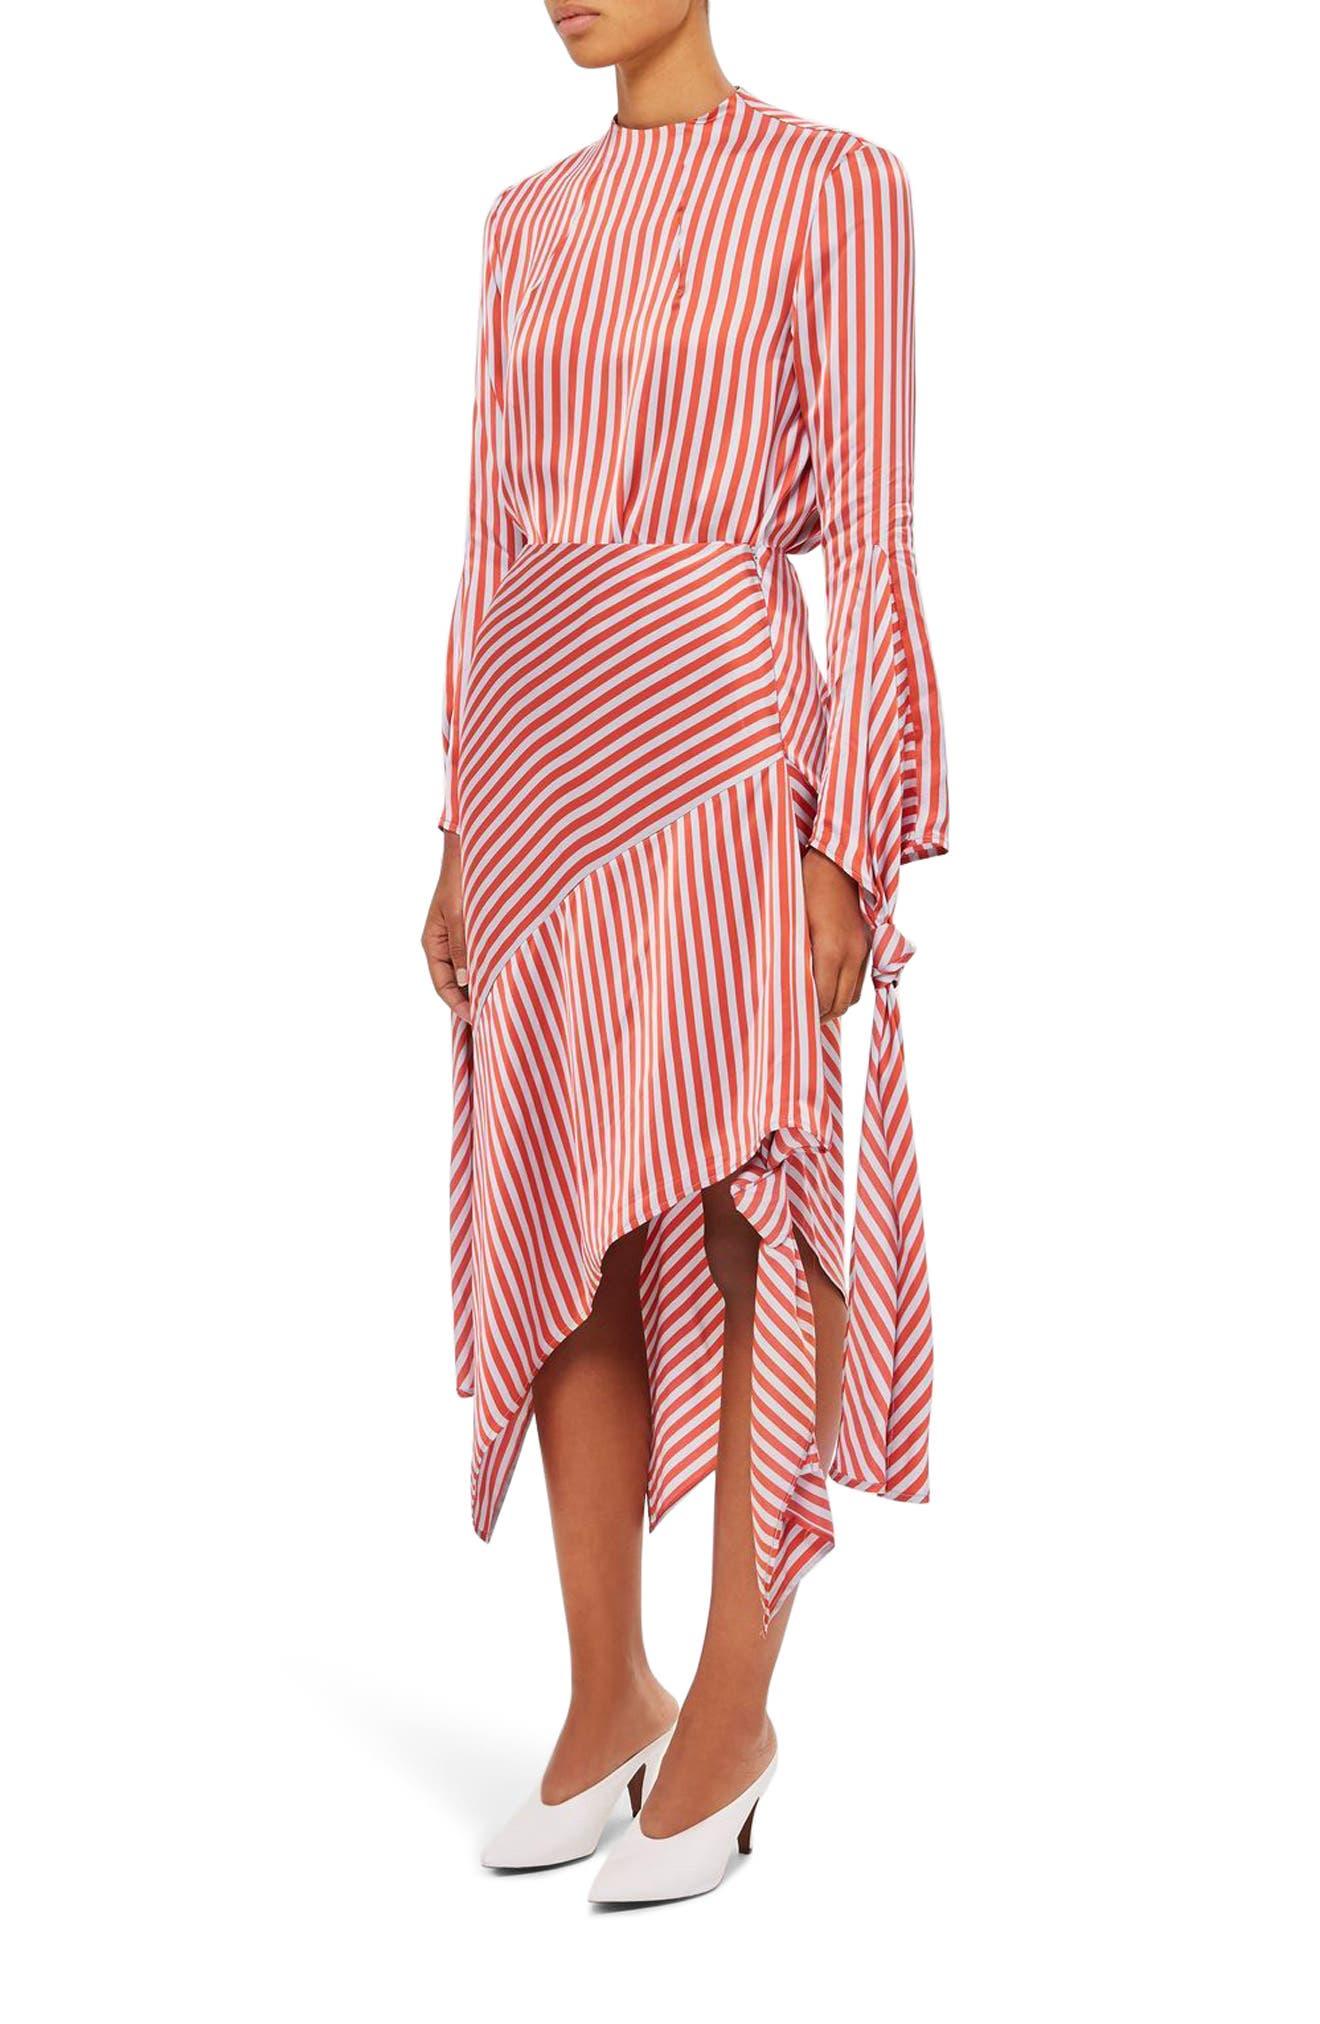 Alternate Image 1 Selected - Topshop Boutique Stripe Knot Midi Skirt